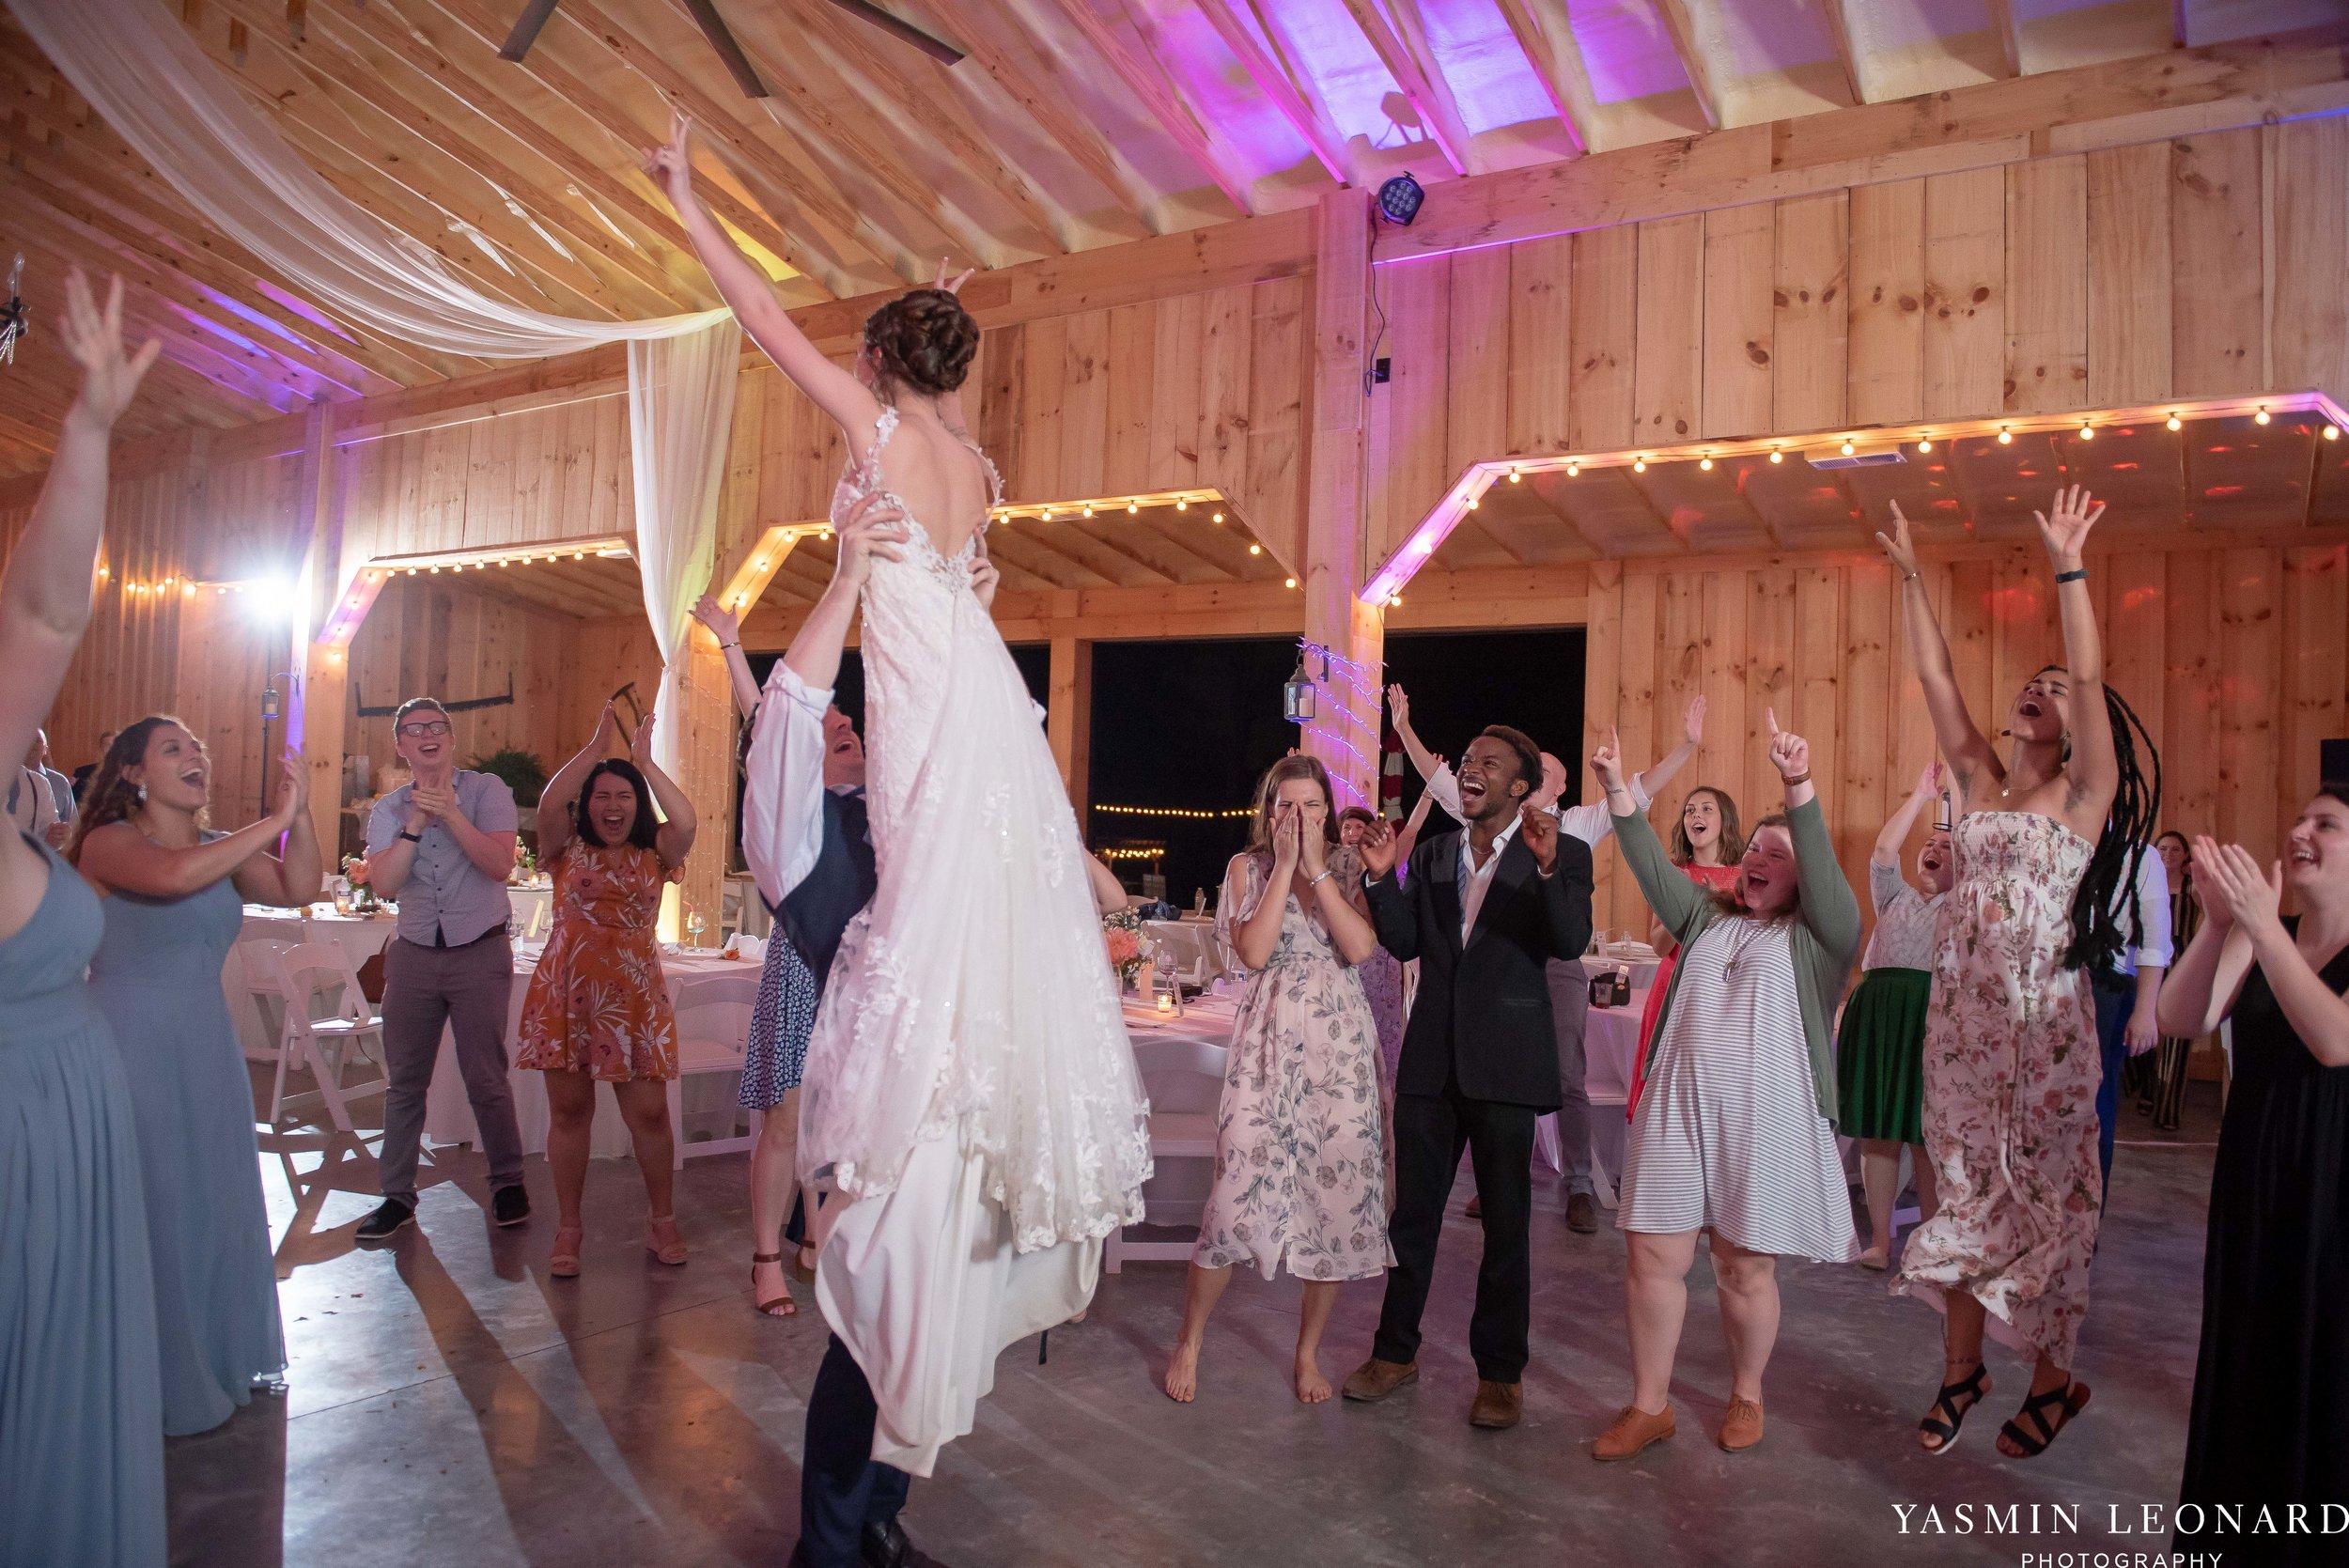 Old Homeplace Vineyard - NC Weddings - Outdoor Summer Weddings - Peony Boutique - Vineyard Wedding - NC Photographer - Yasmin Leonard Photography-78.jpg